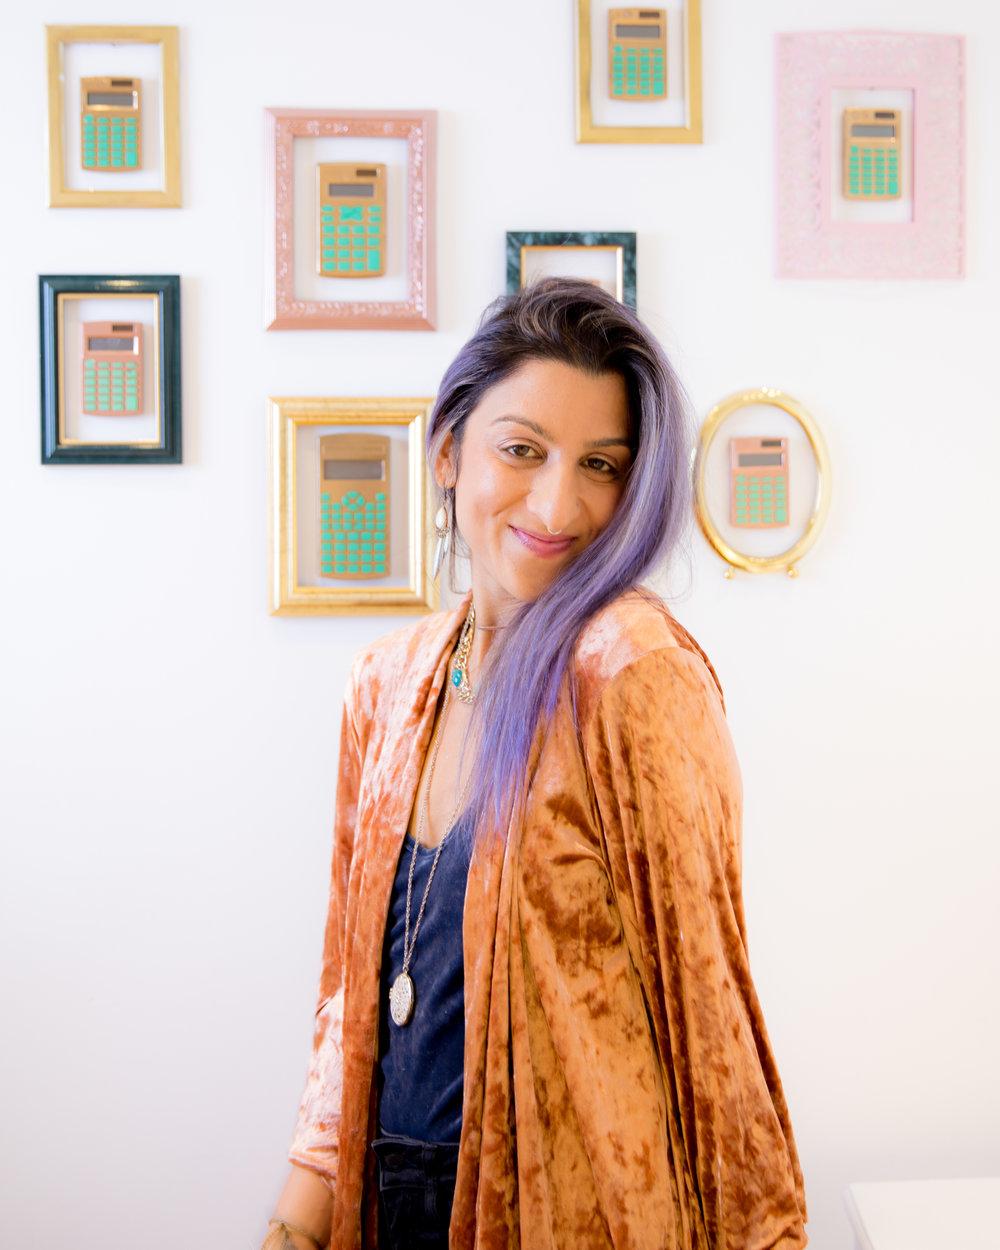 Vanessa Vakharia, Founder + CEO of The Math Guru